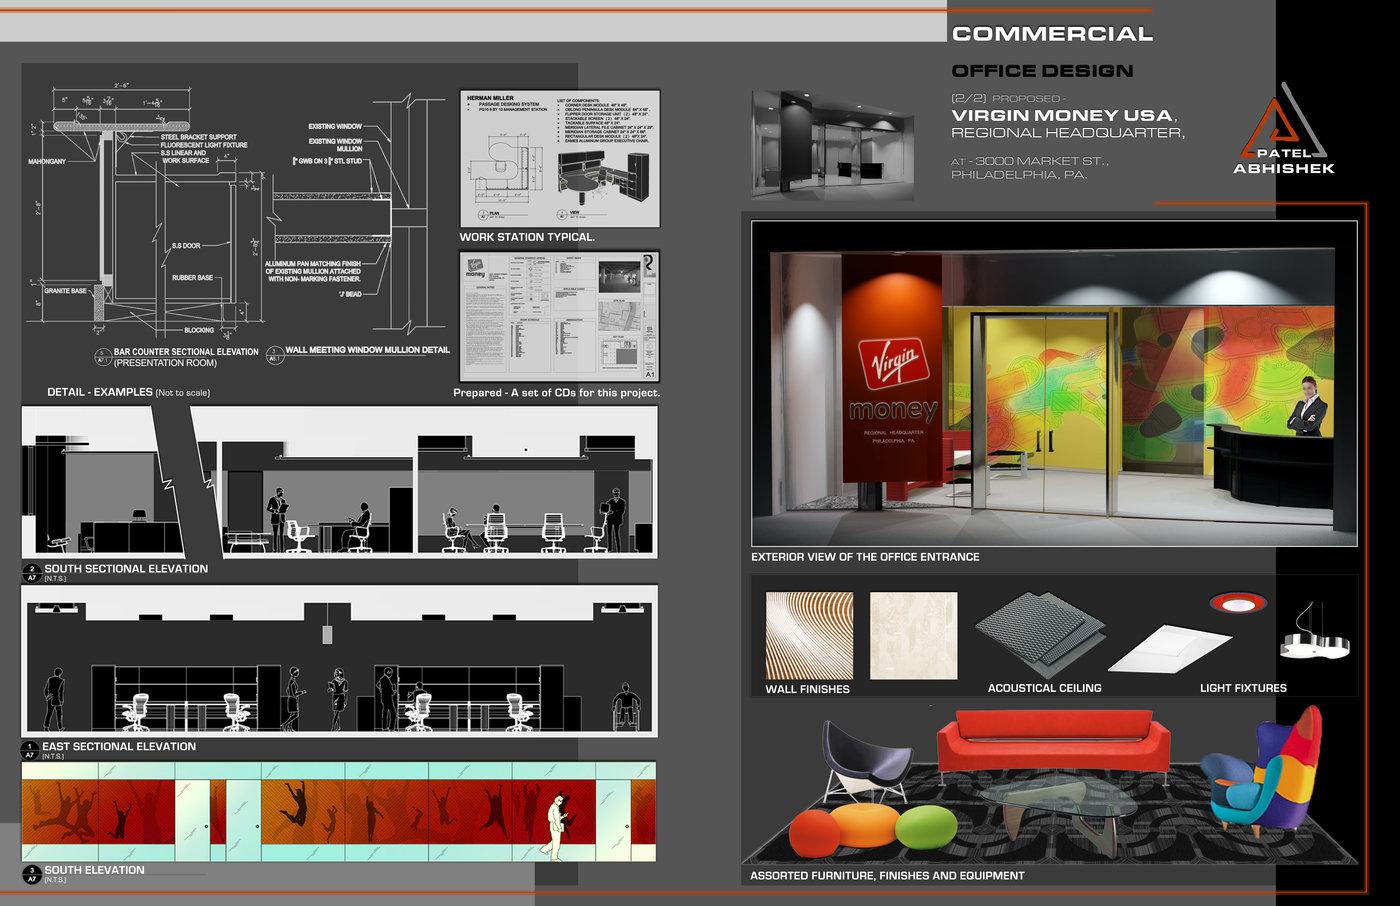 Interior Architecture Design Portfolio Sample By Abhishek Patel Cid Leed Ap At